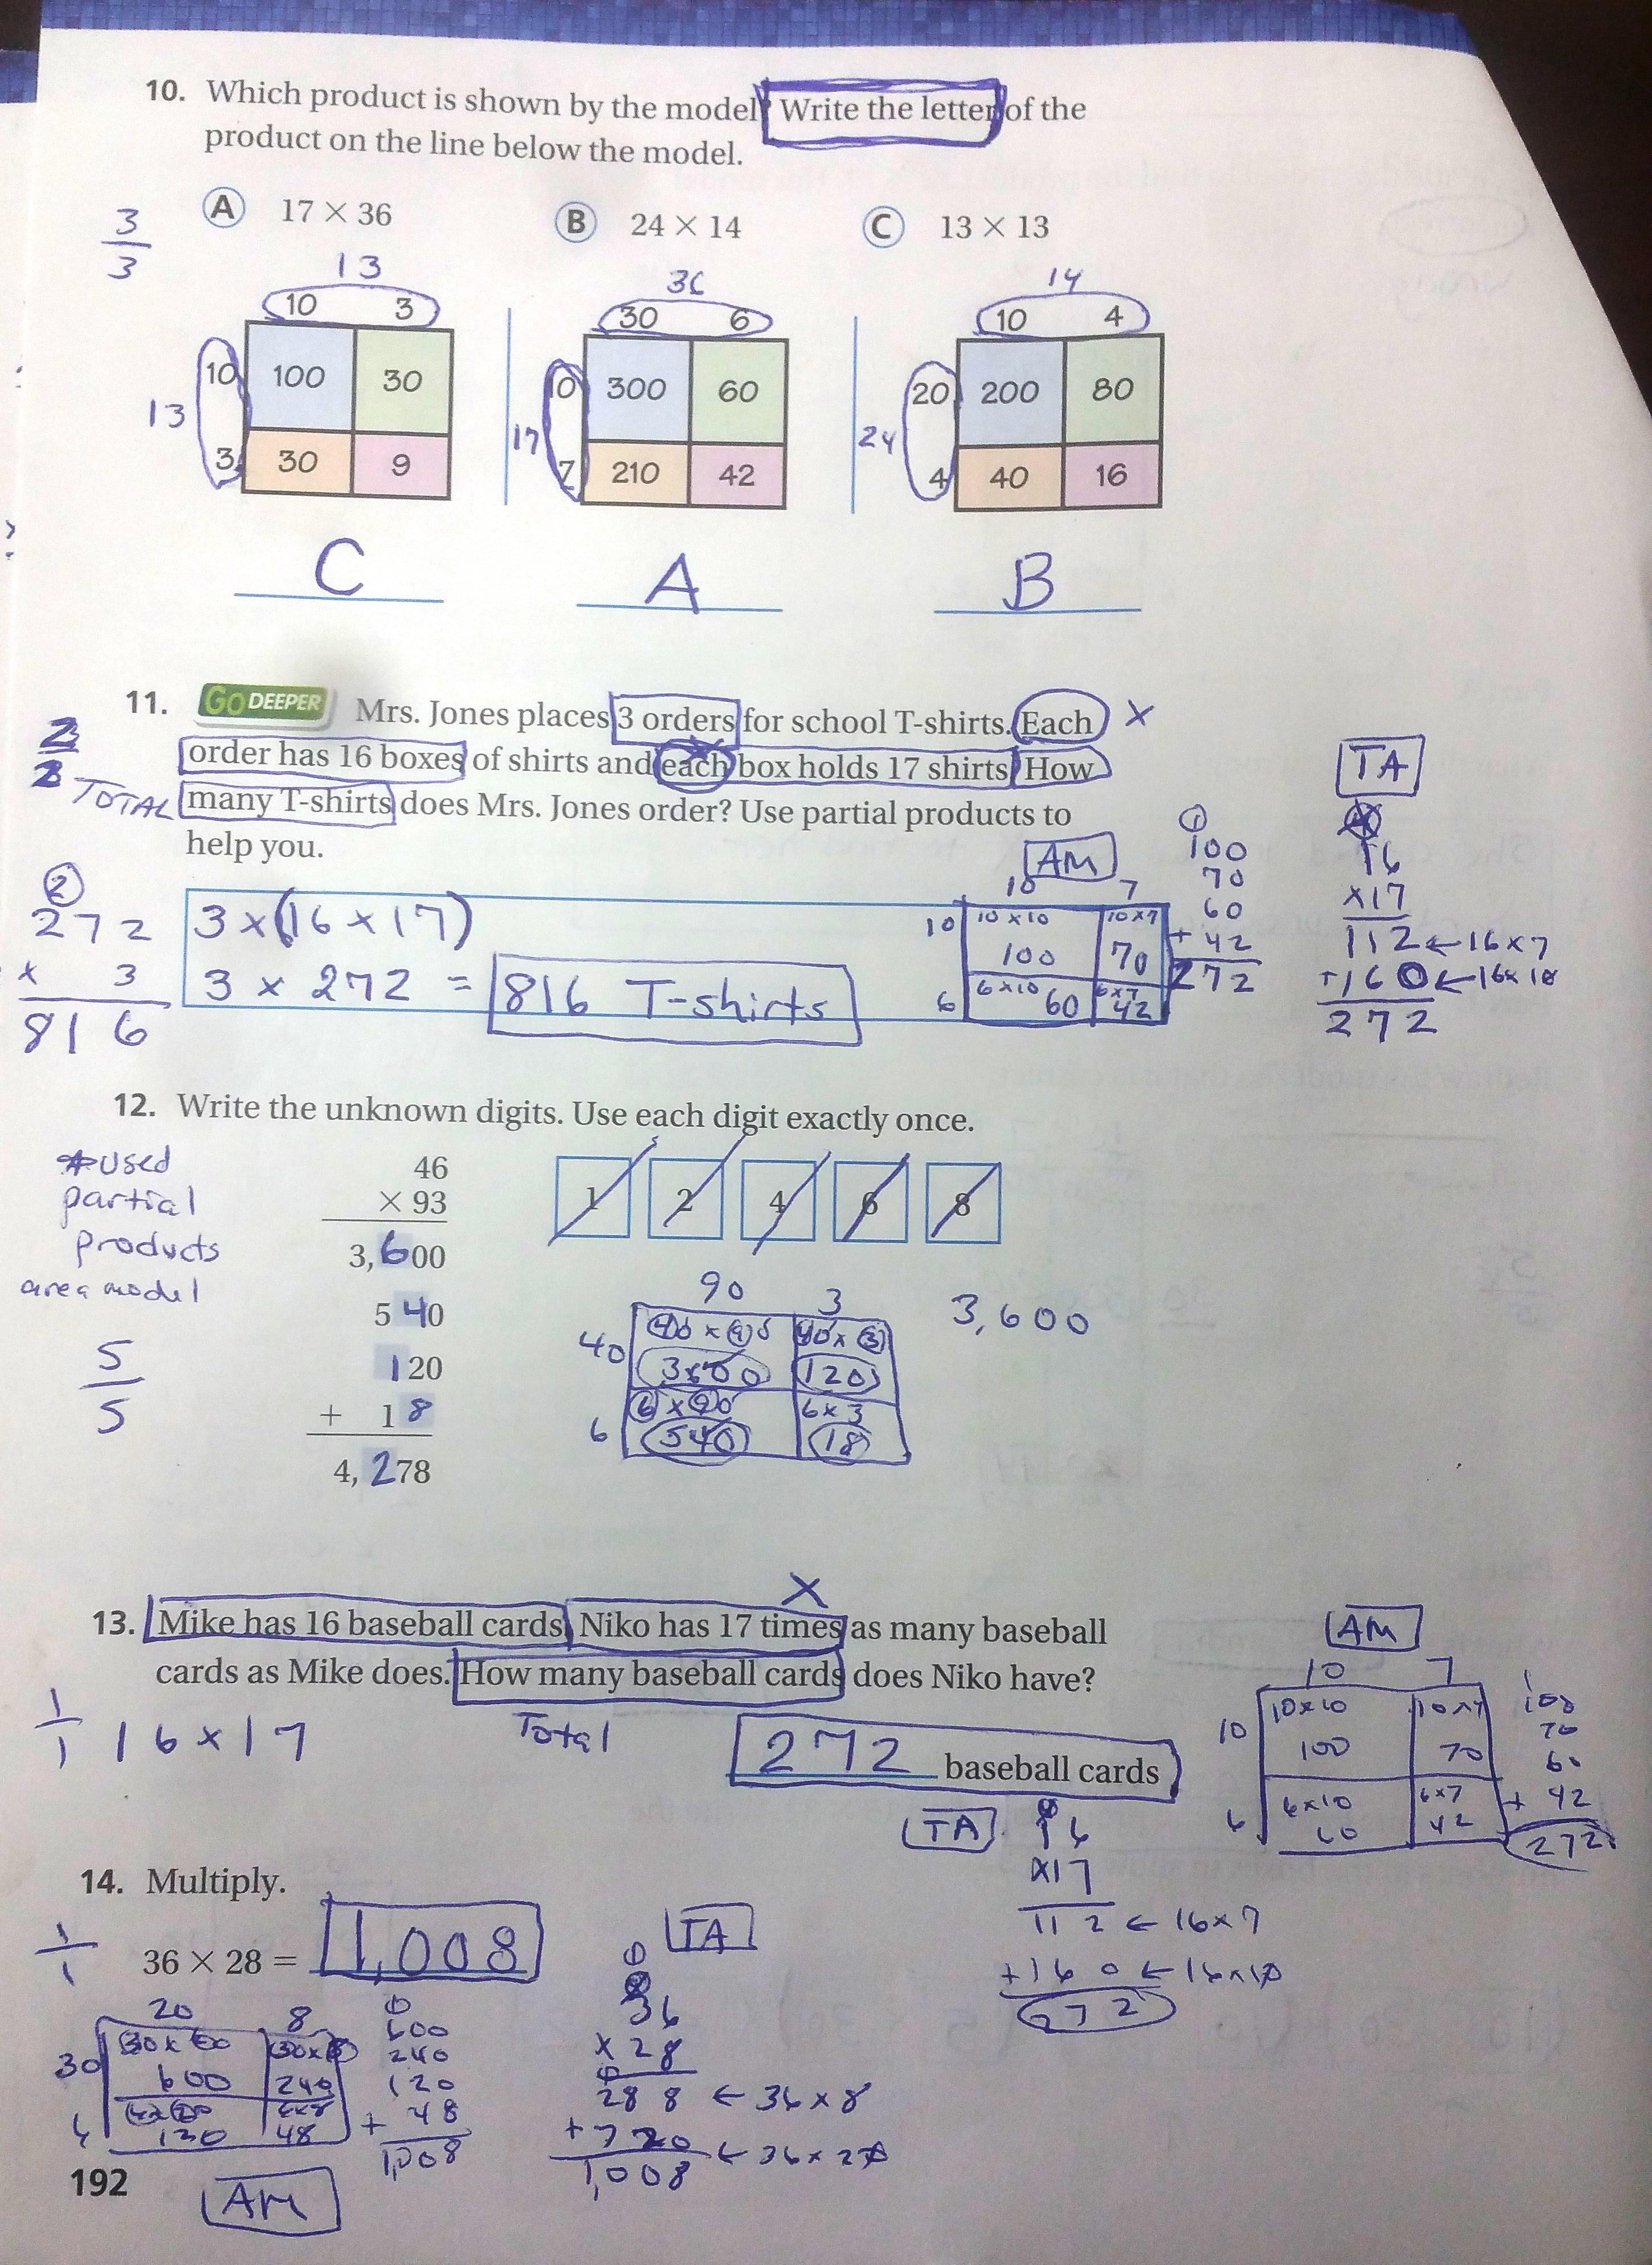 Go Math Login: Homeschool Math Worksheets Teacher Math Worksheets | Go Math Printable Worksheets